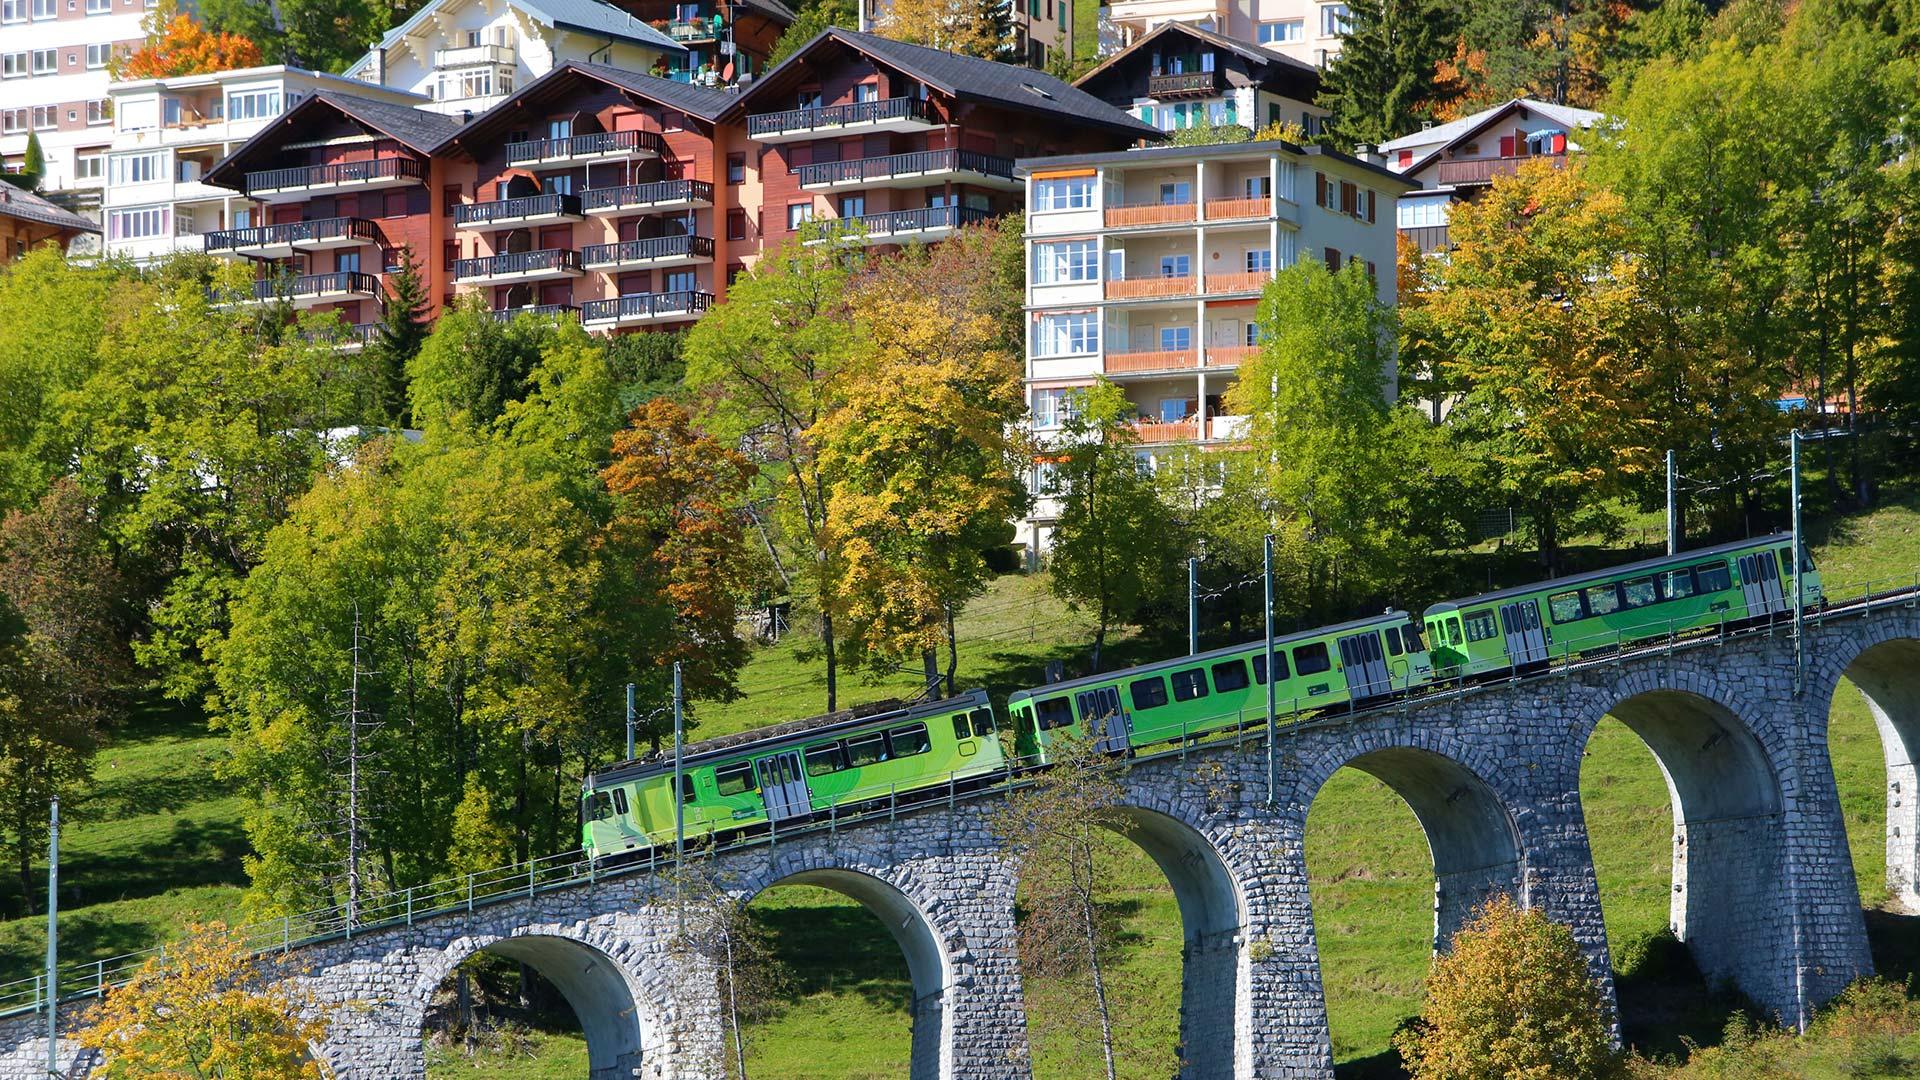 Leysin-Ete-Train-Aigle-Leysin-Maisons